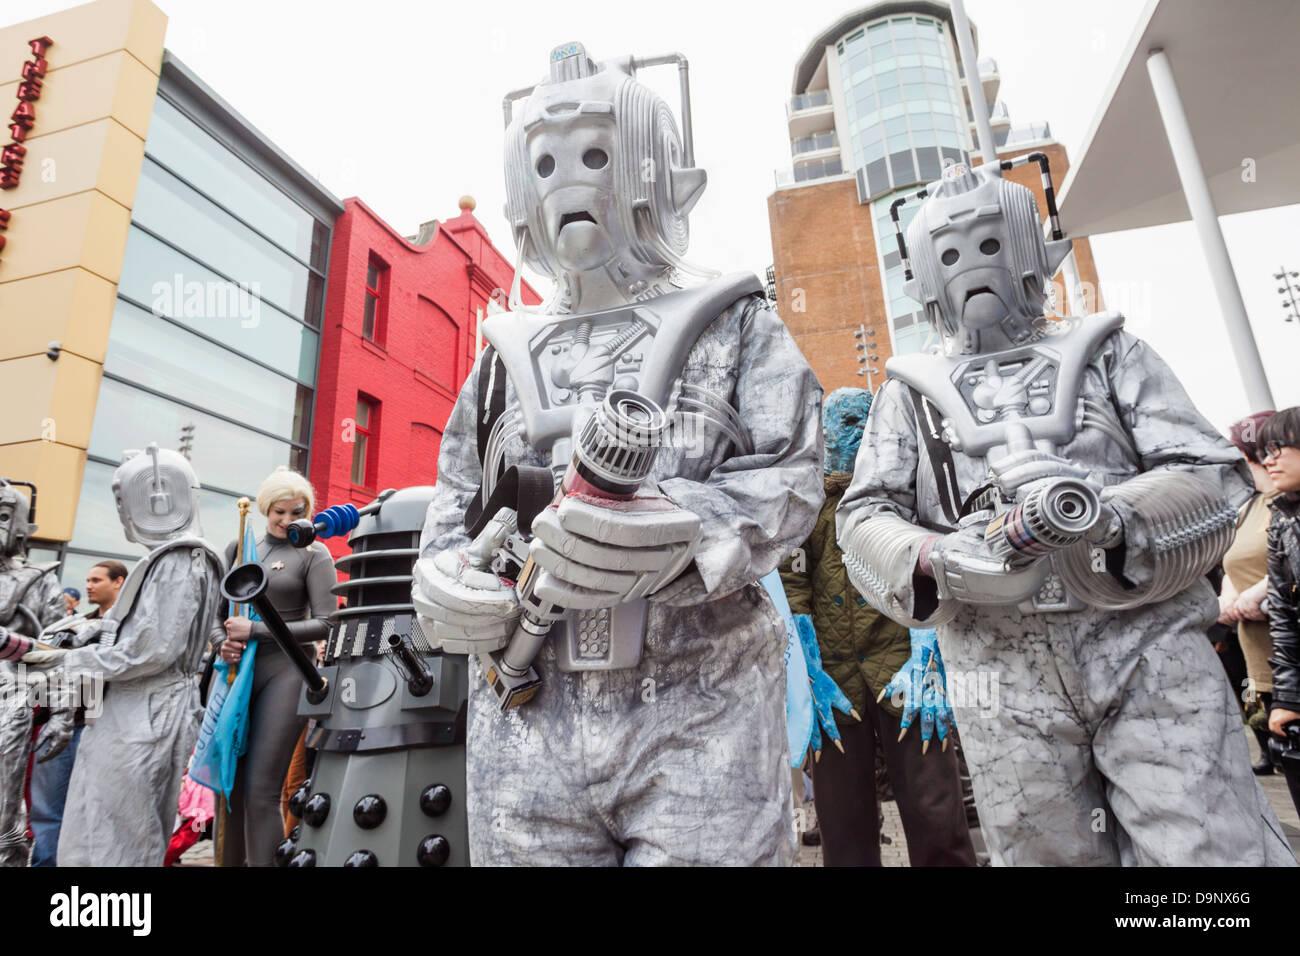 England, London, Stratford, Annual Sci-fi Costume Parade, Dalek and Cyborgs - Stock Image